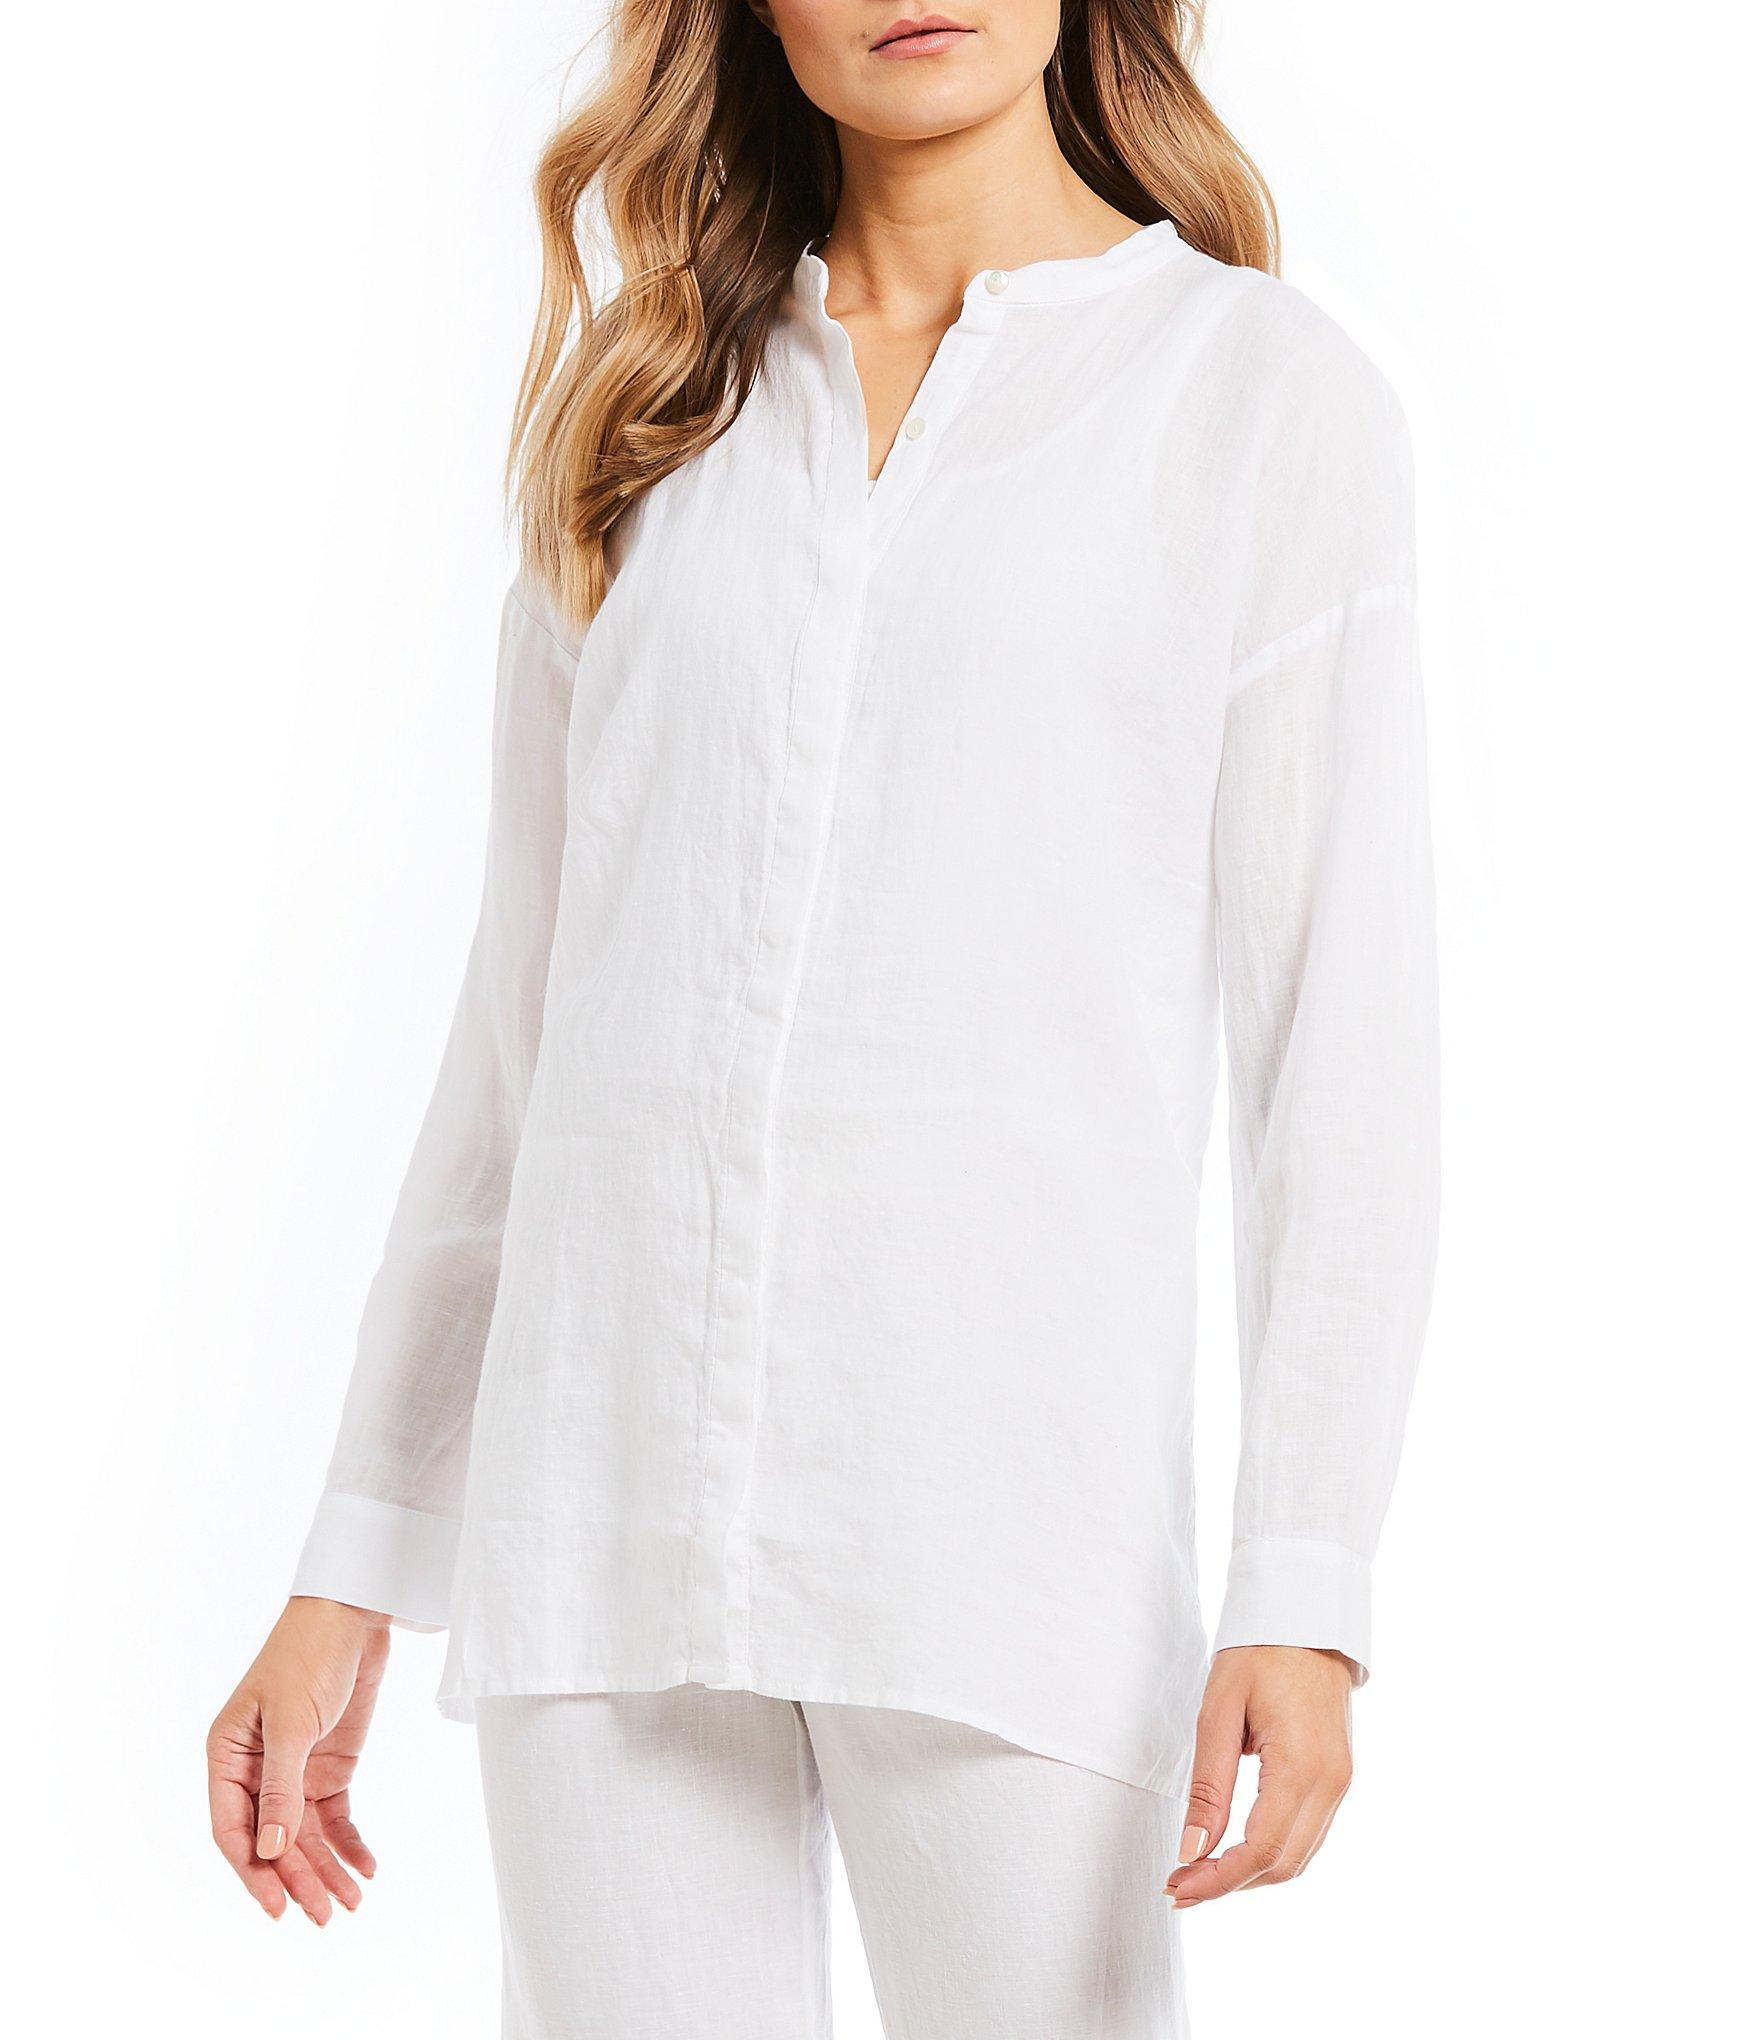 f66adf49891 Eileen Fisher. Women's White Petite Size Mandarin Collar Button Front Tunic  Shirt